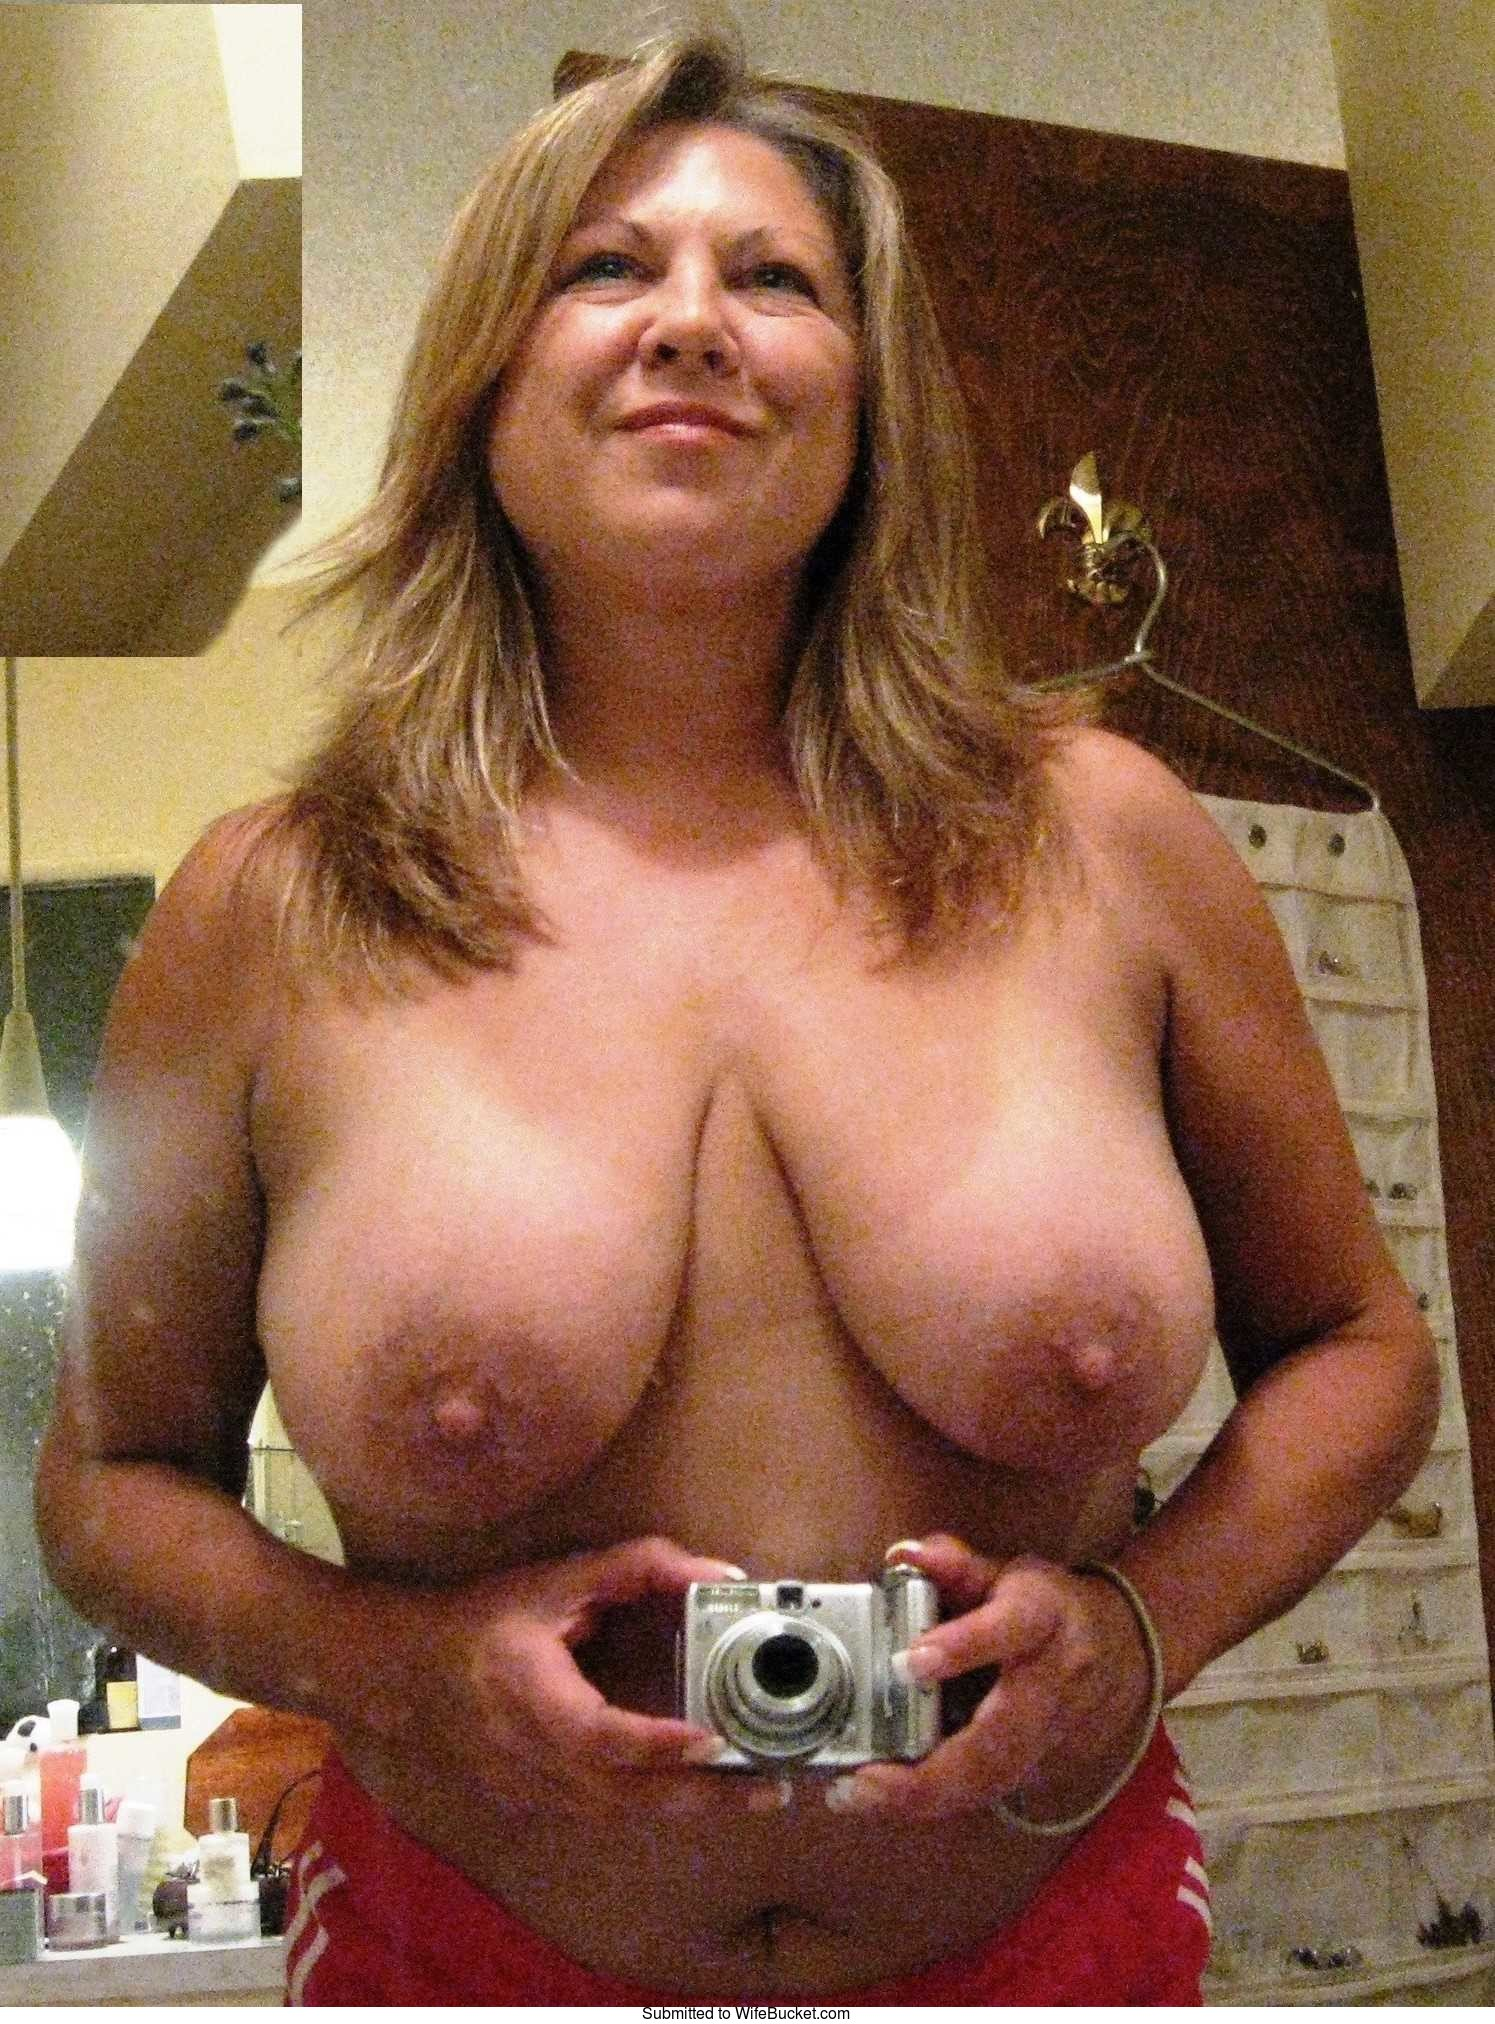 Naked Sexy Nude Selfies  Hot Girl Hd Wallpaper-4162